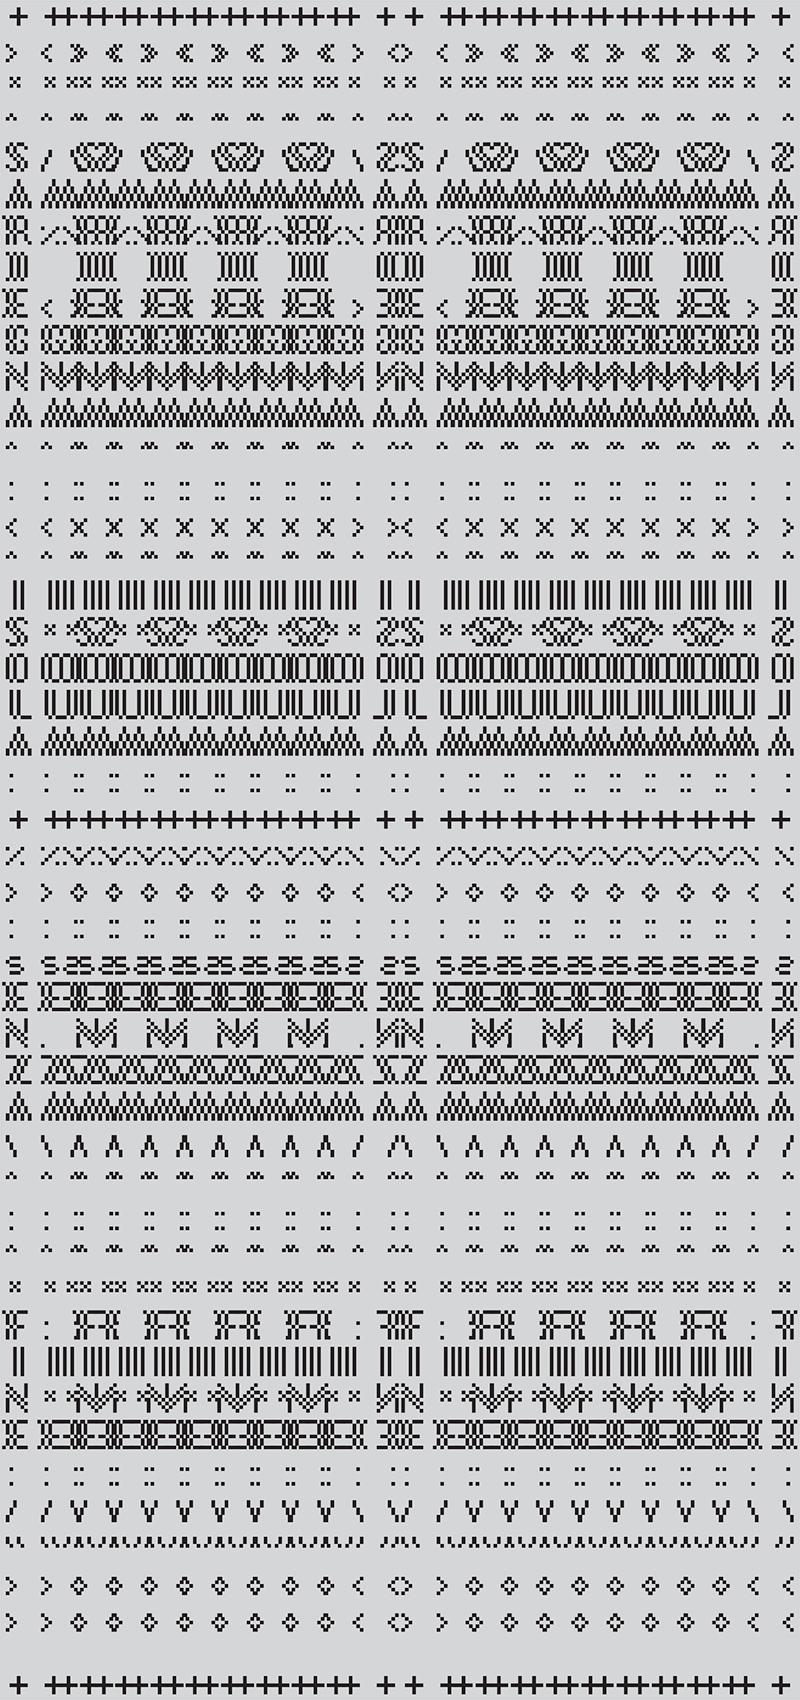 arazzi-typo-sardegna-14